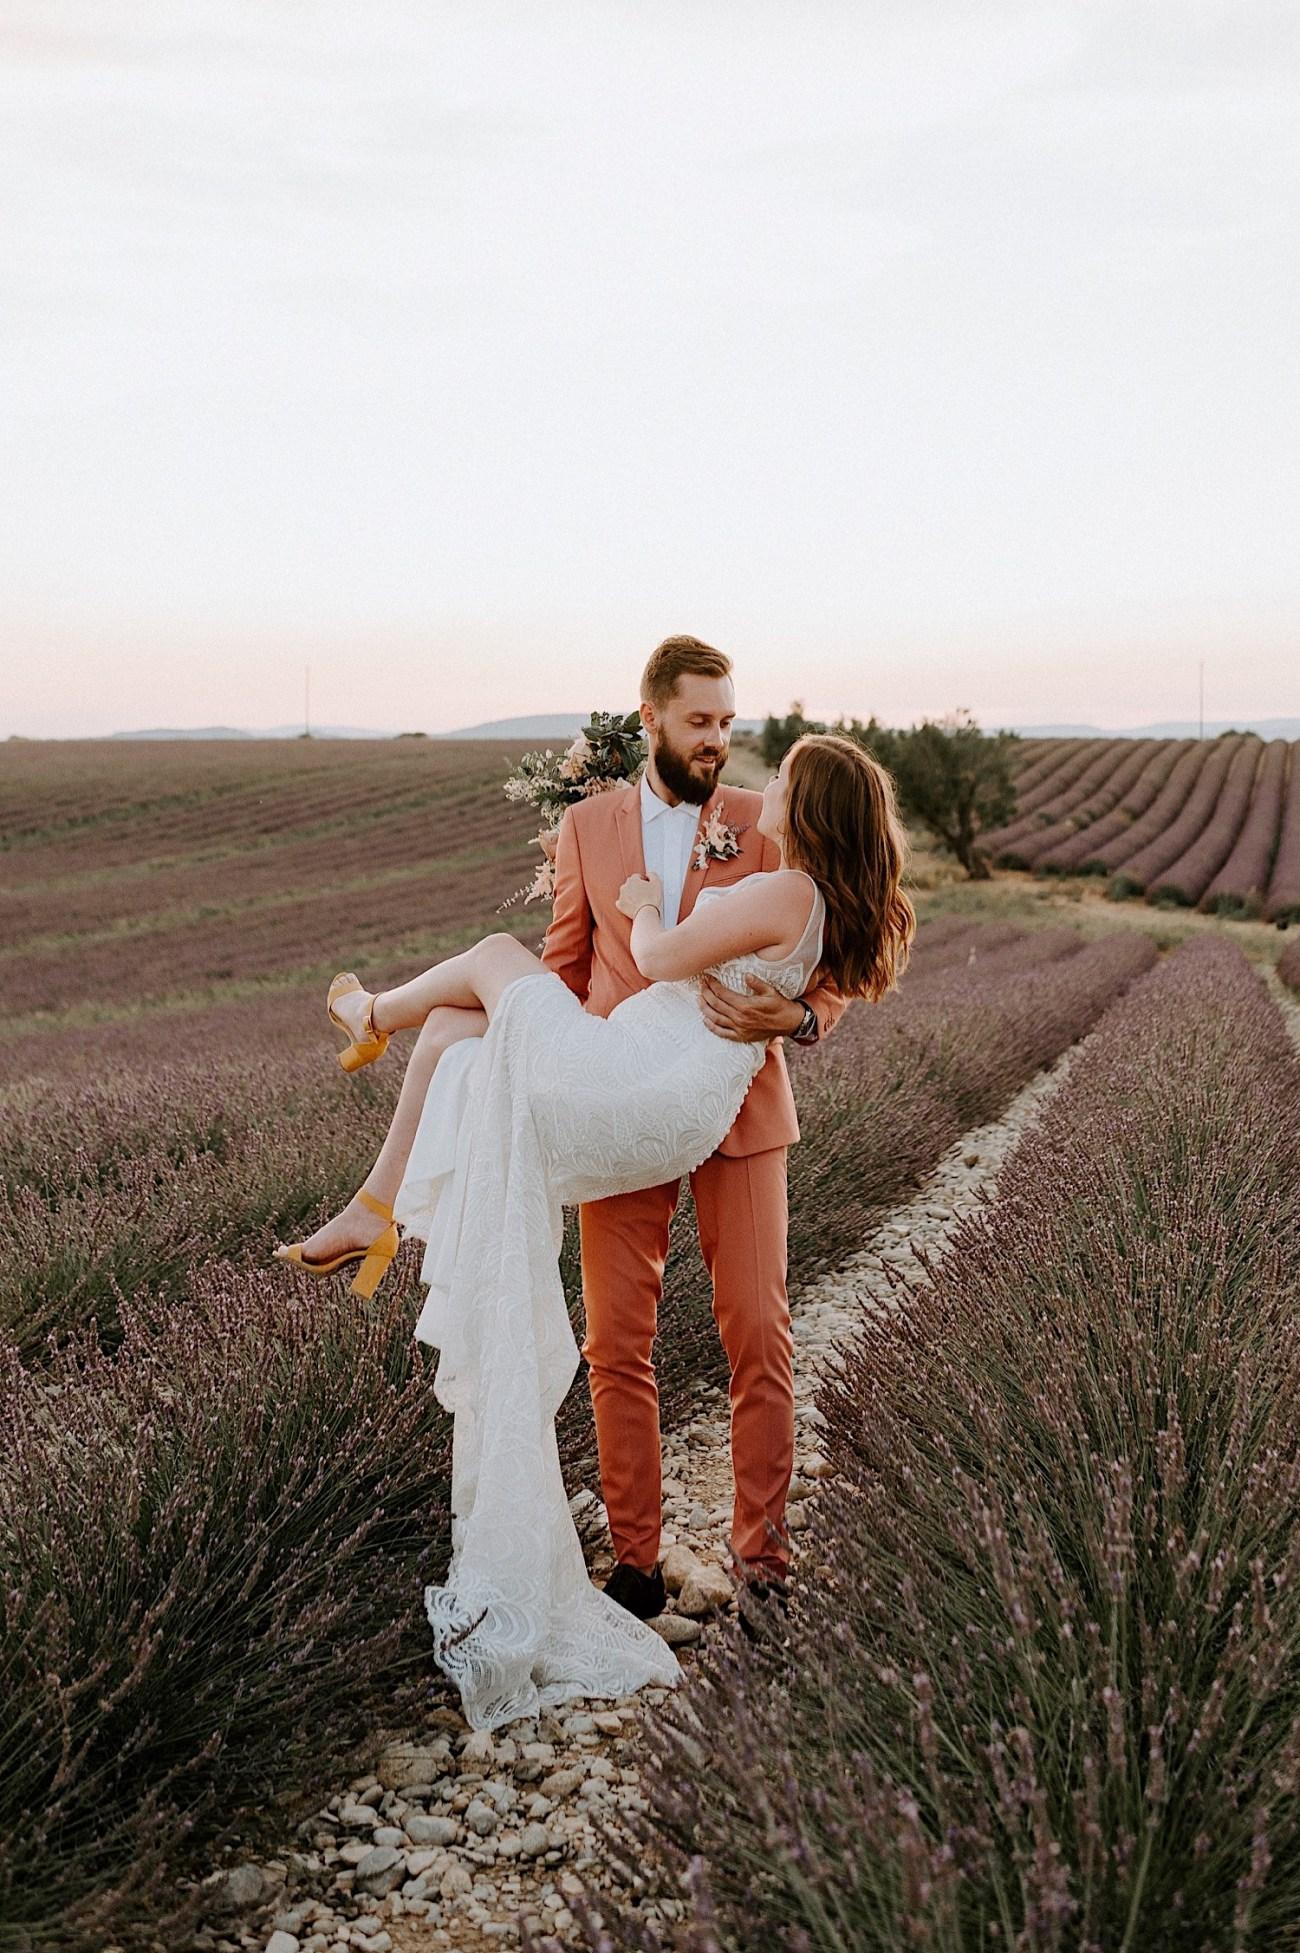 Valensole Wedding Photos Lavender Field Wedding Provence Wedding French Wedding Photographer Destination Wedding France Anais Possamai Photography 05